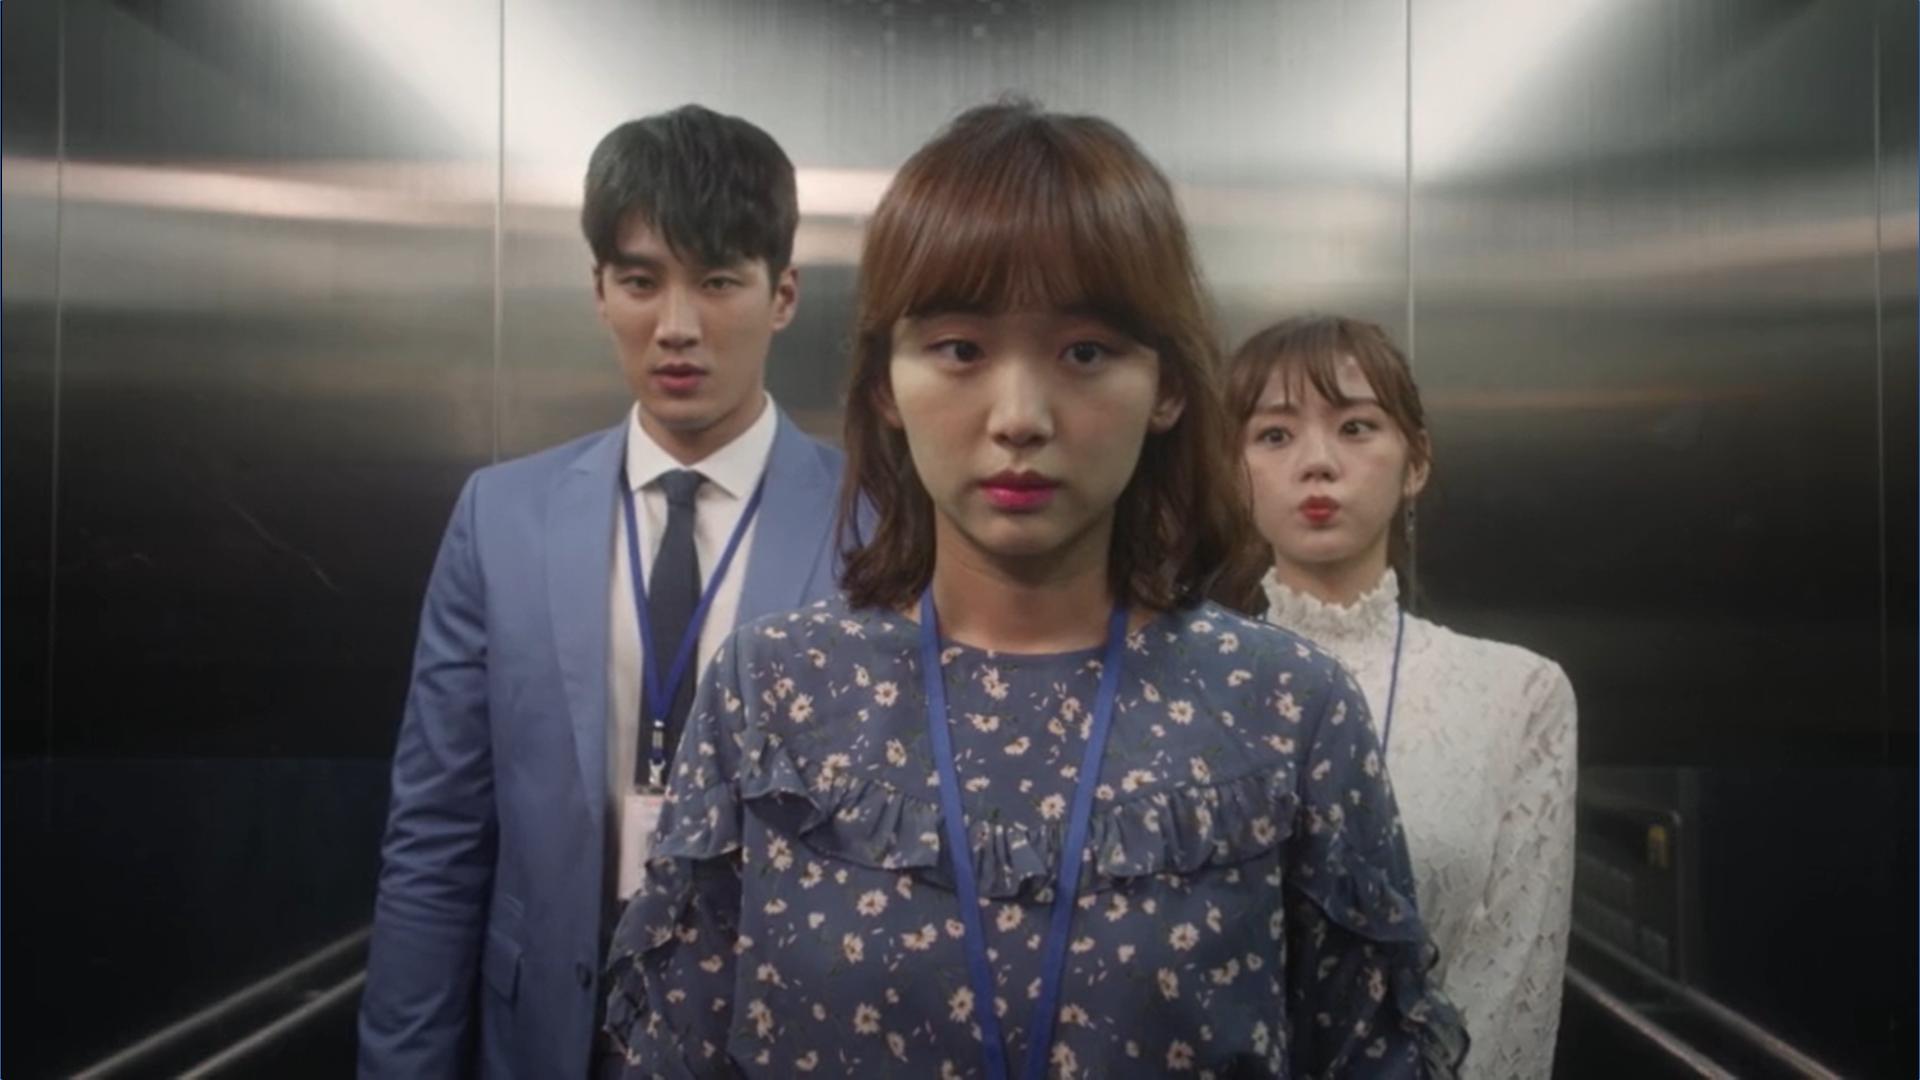 Wednesday 3:30 PM Seon Eun-woo seeing Baek Seung-gyu and Kim Hye-won holding hands